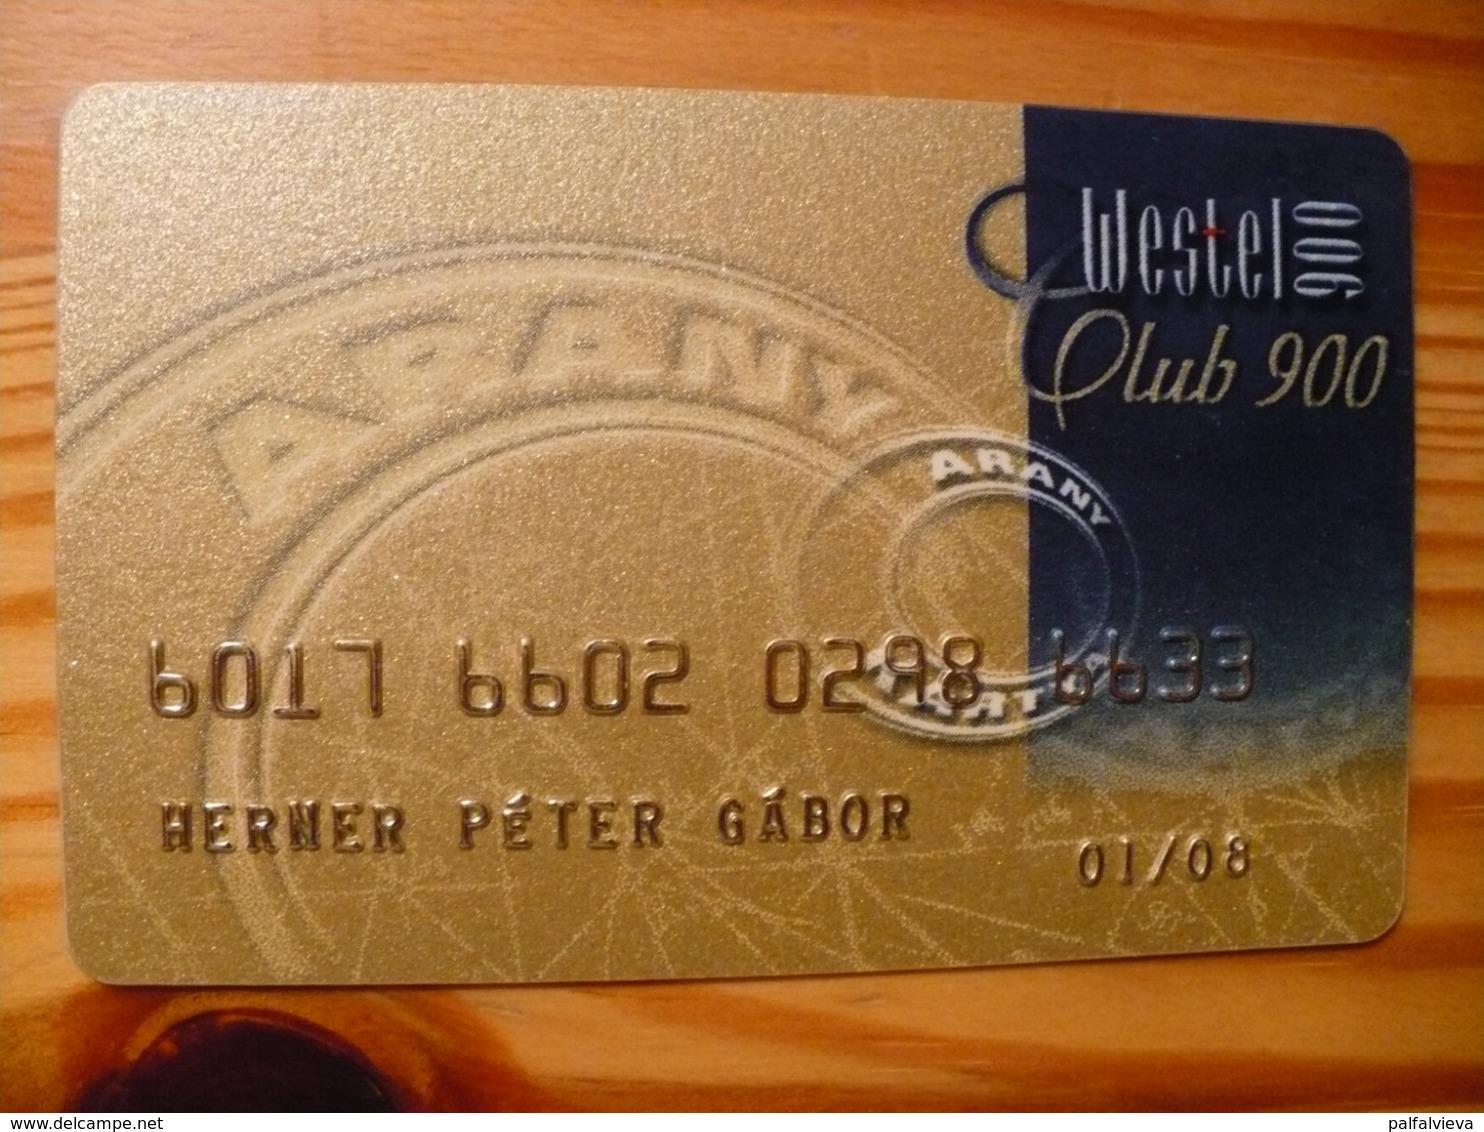 Westel 900 Club Card Hungary - Andere Sammlungen